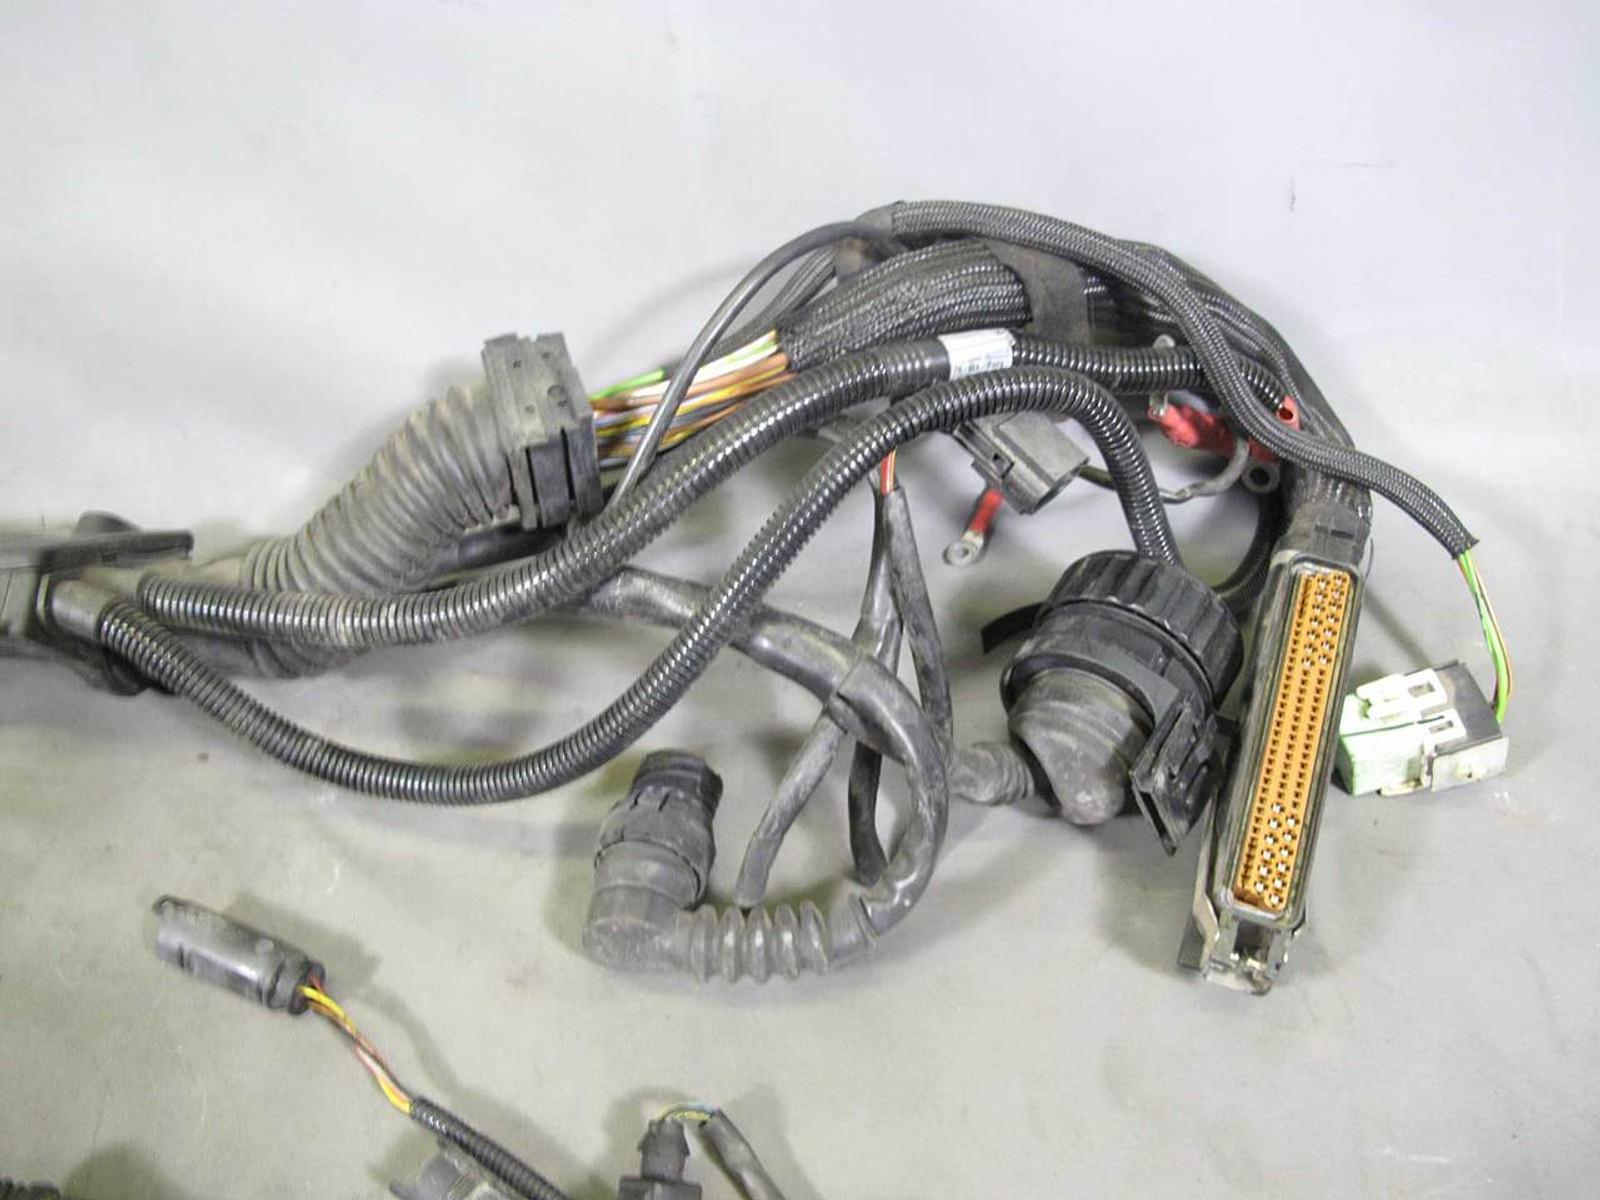 328i wiring harness trusted wiring diagram rh 8 4 1 gartenmoebel rupp de 1997 bmw 328i [ 1280 x 960 Pixel ]